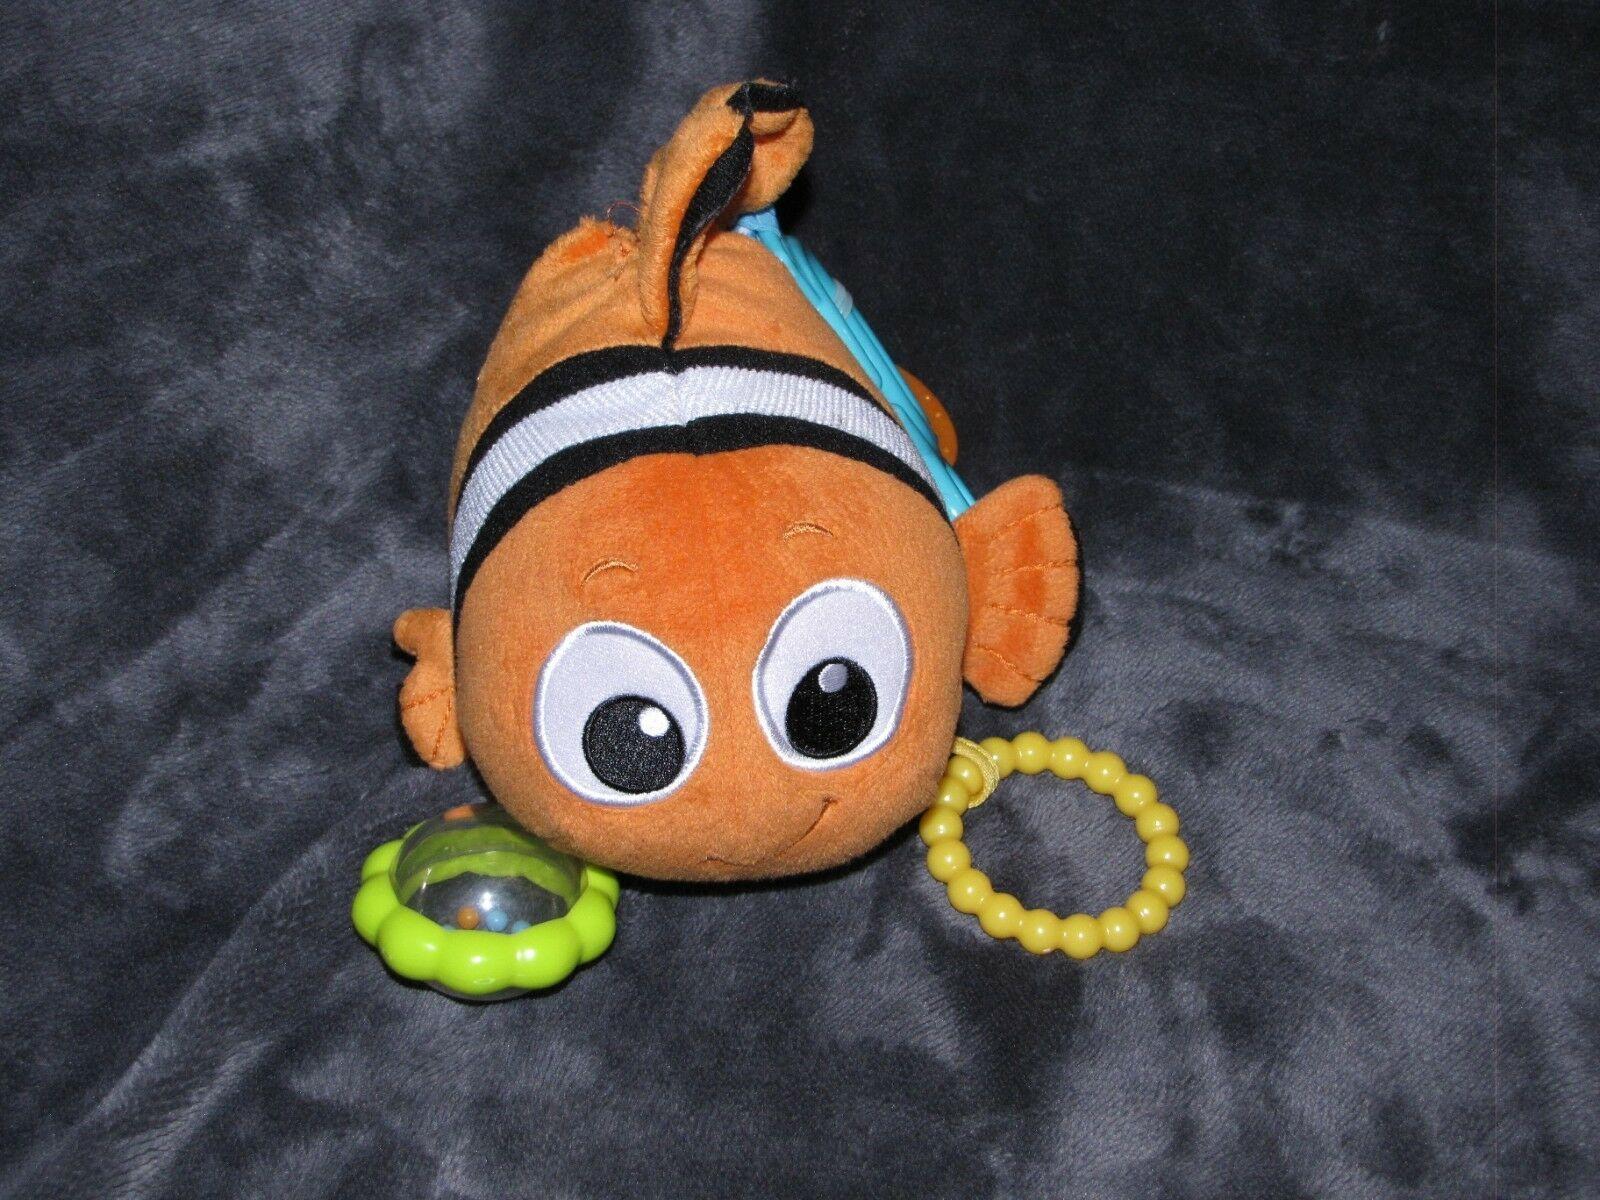 KIDS PREFERRED DISNEY BABY FINDING NEMO ORANGE CLOWNFISH CLOWN FISH RING TOY image 2